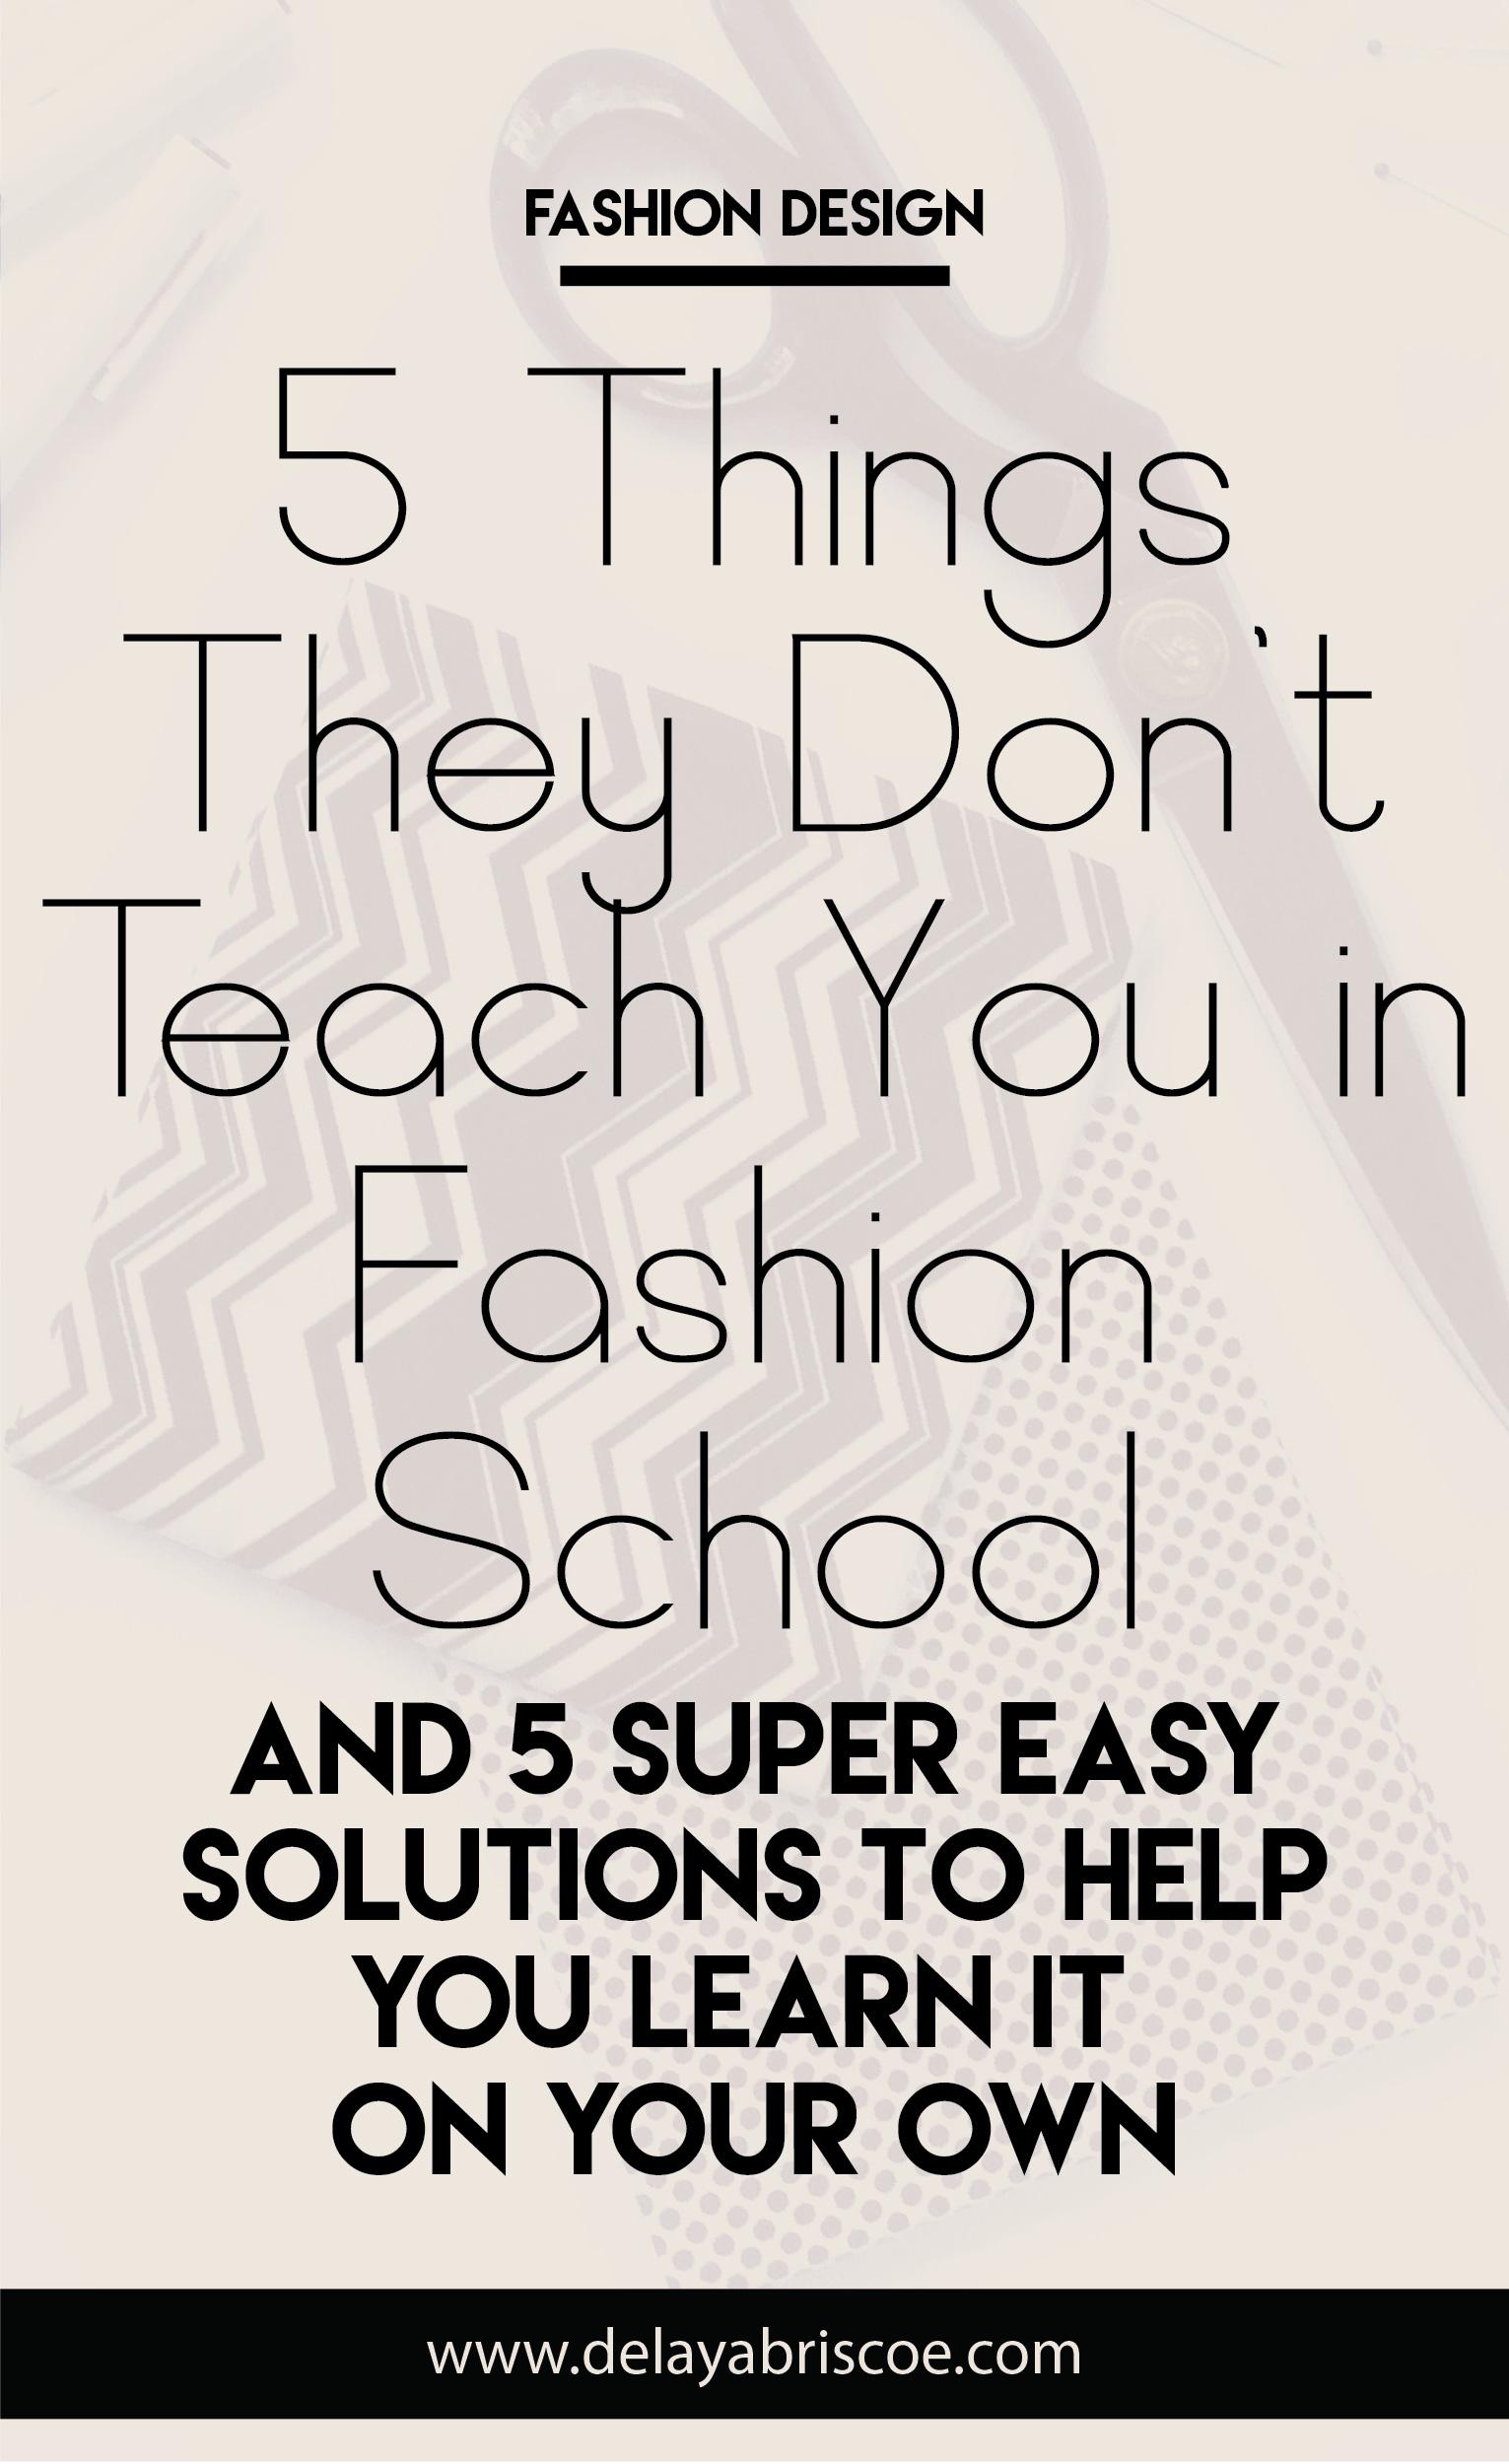 THINGS-TEACH-FASHION-DESIGN-SCHOOL